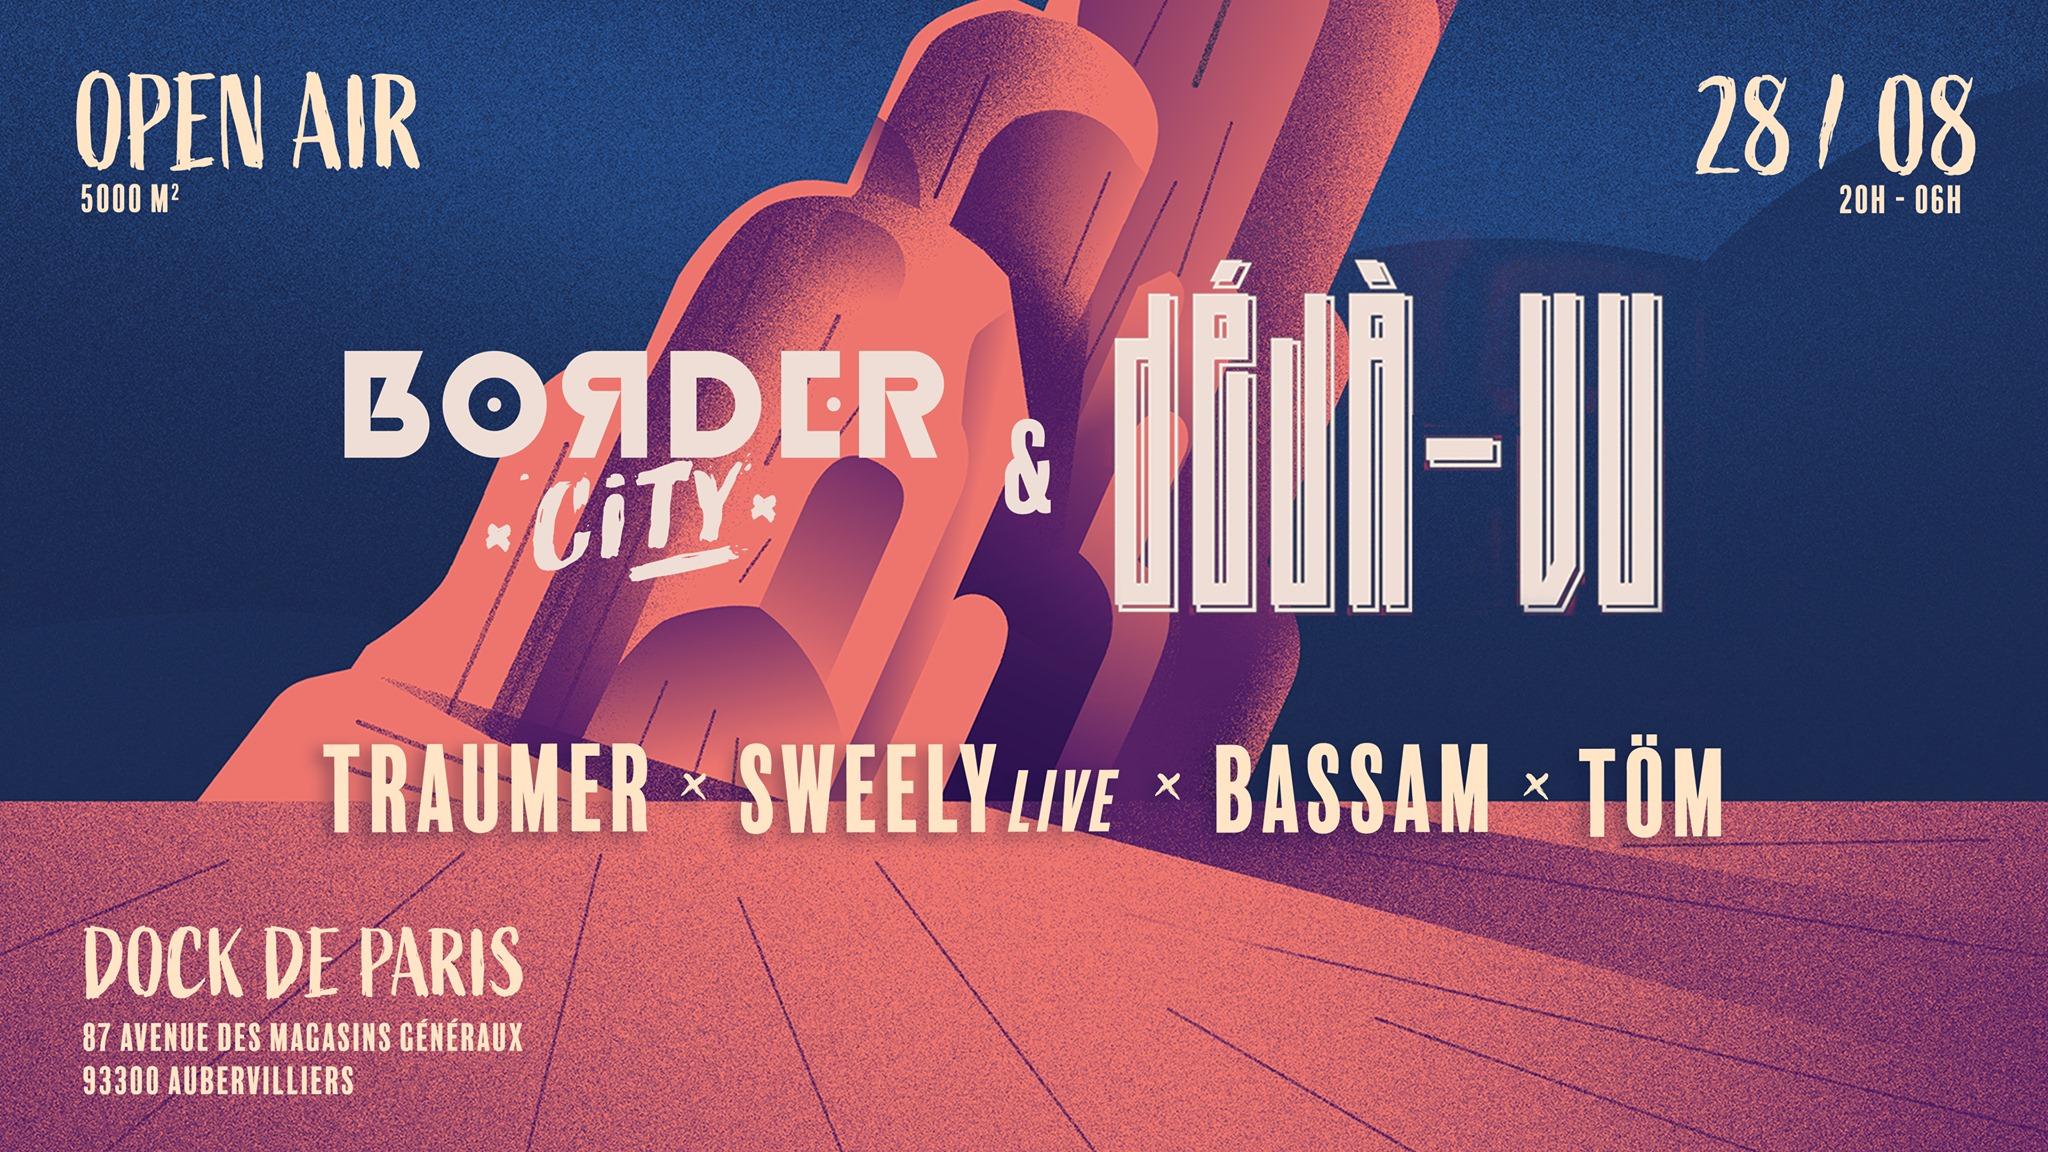 Border City x Déjà-Vu w/ Traumer l Sweely (live) l Bassam l Töm